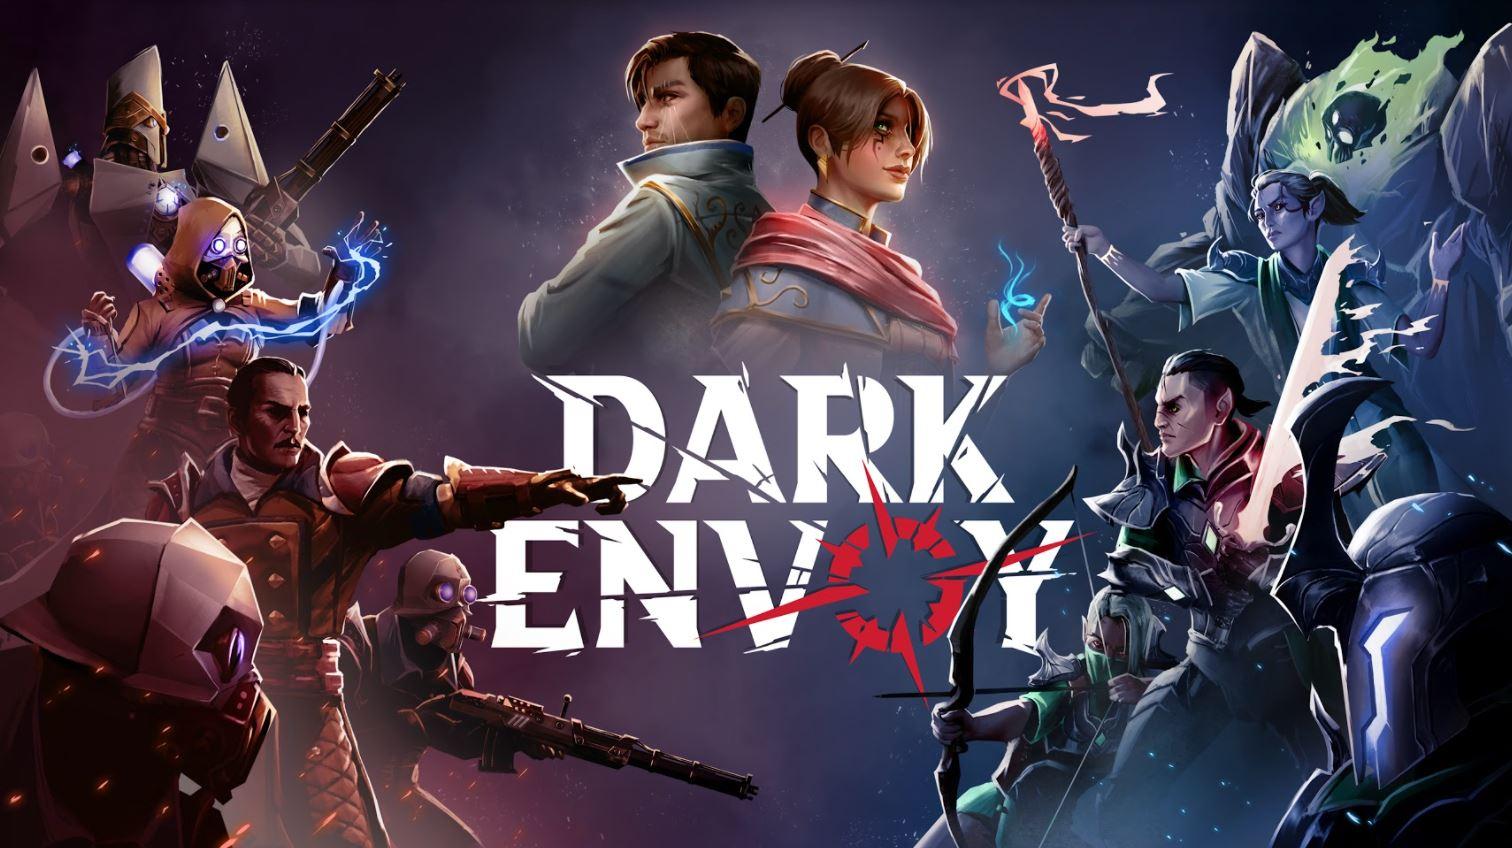 dark-envoy-news-reviews-videos